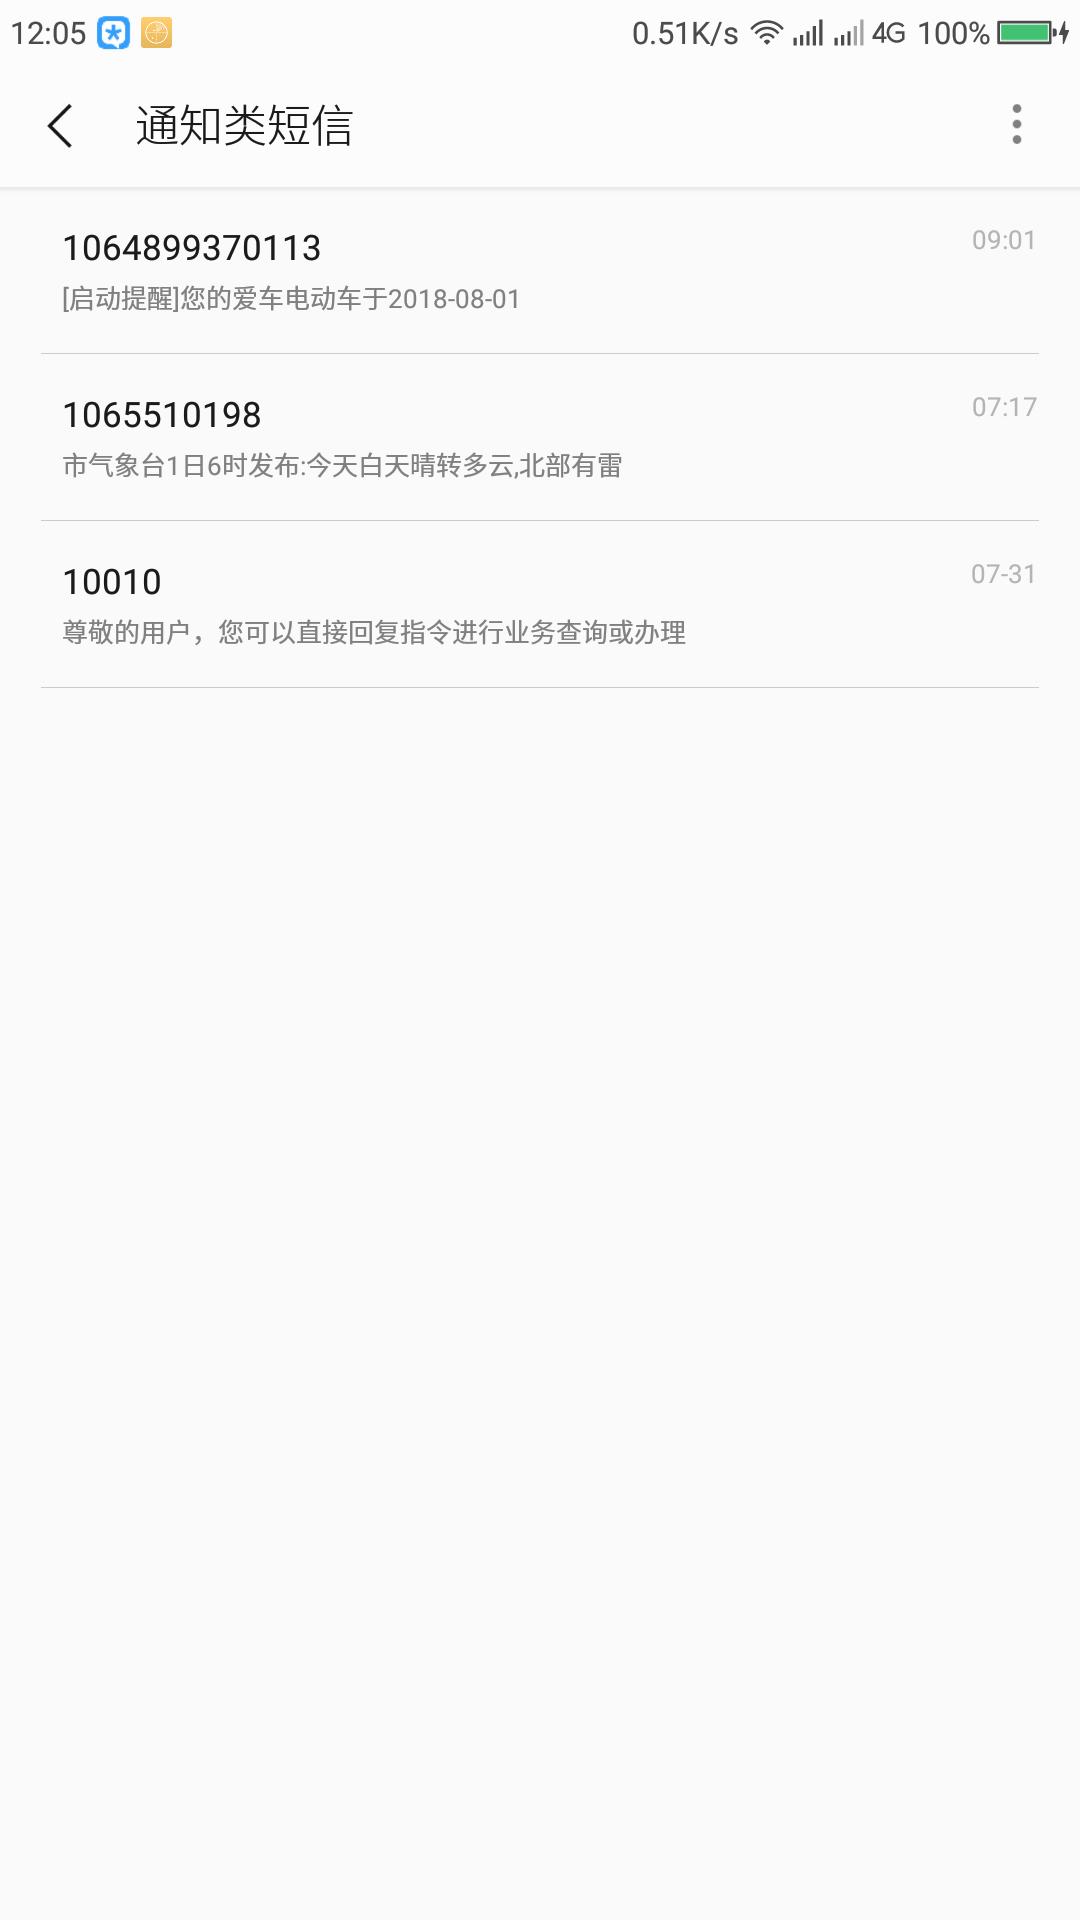 Screenshot_2018-08-01-12-05-06.png